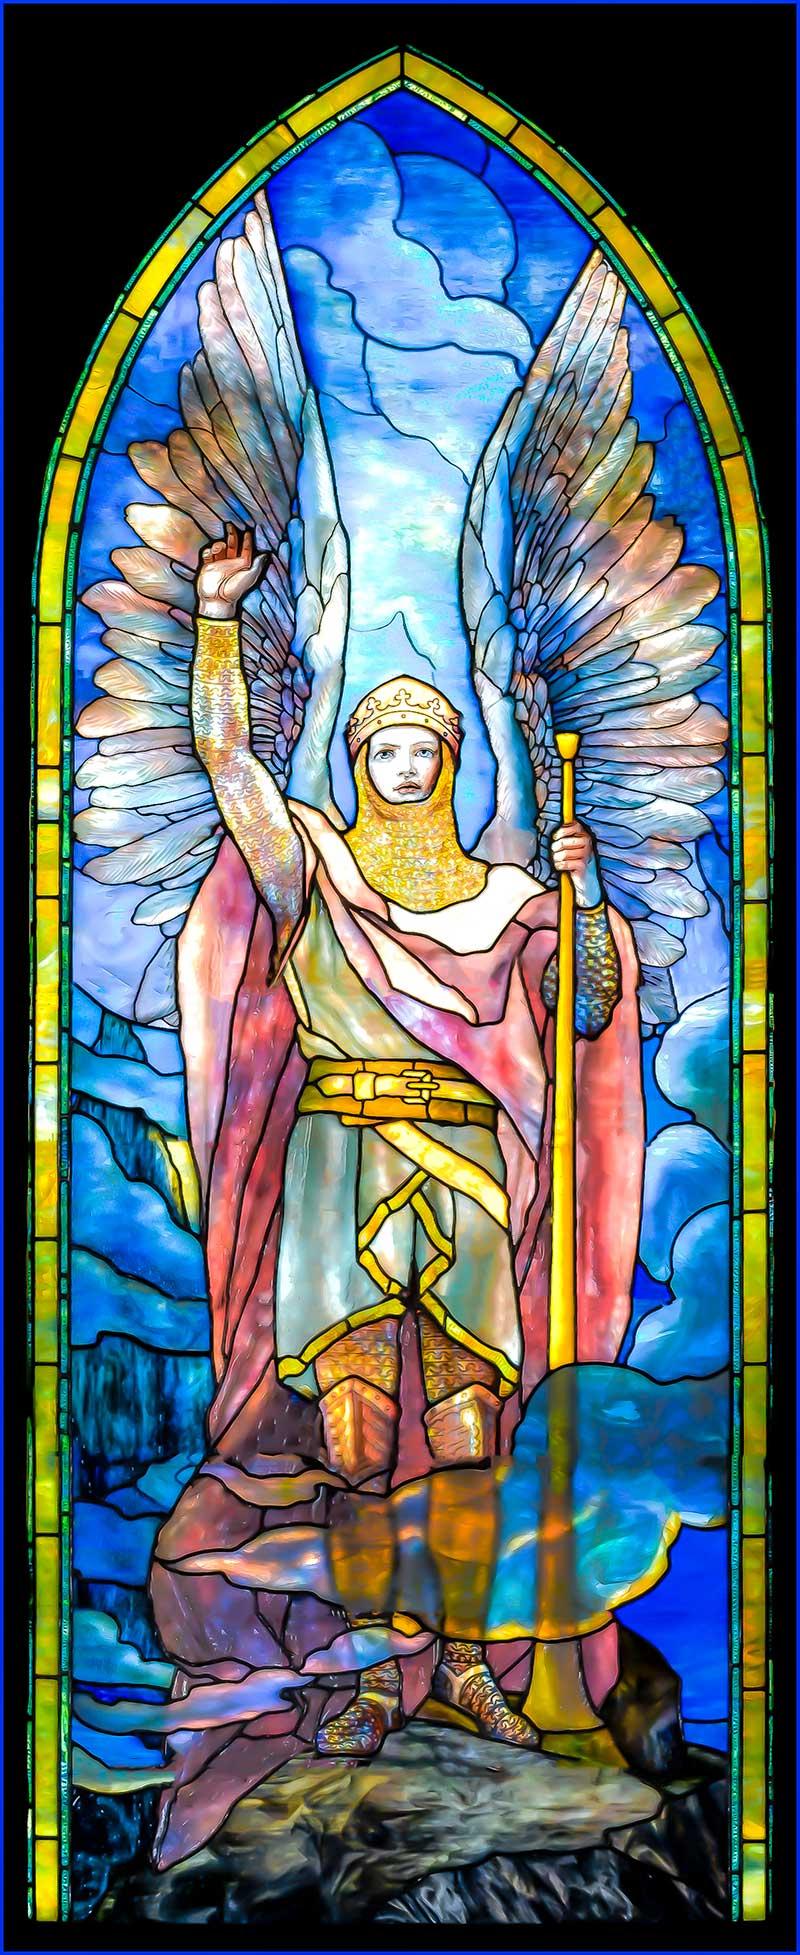 Tiffany,-ArchAngel-Gabriel,-Bar-None,-Baltimore-Brown-Memorial,-5682_3_4-Edit-Edit-Edit,-8-21-21